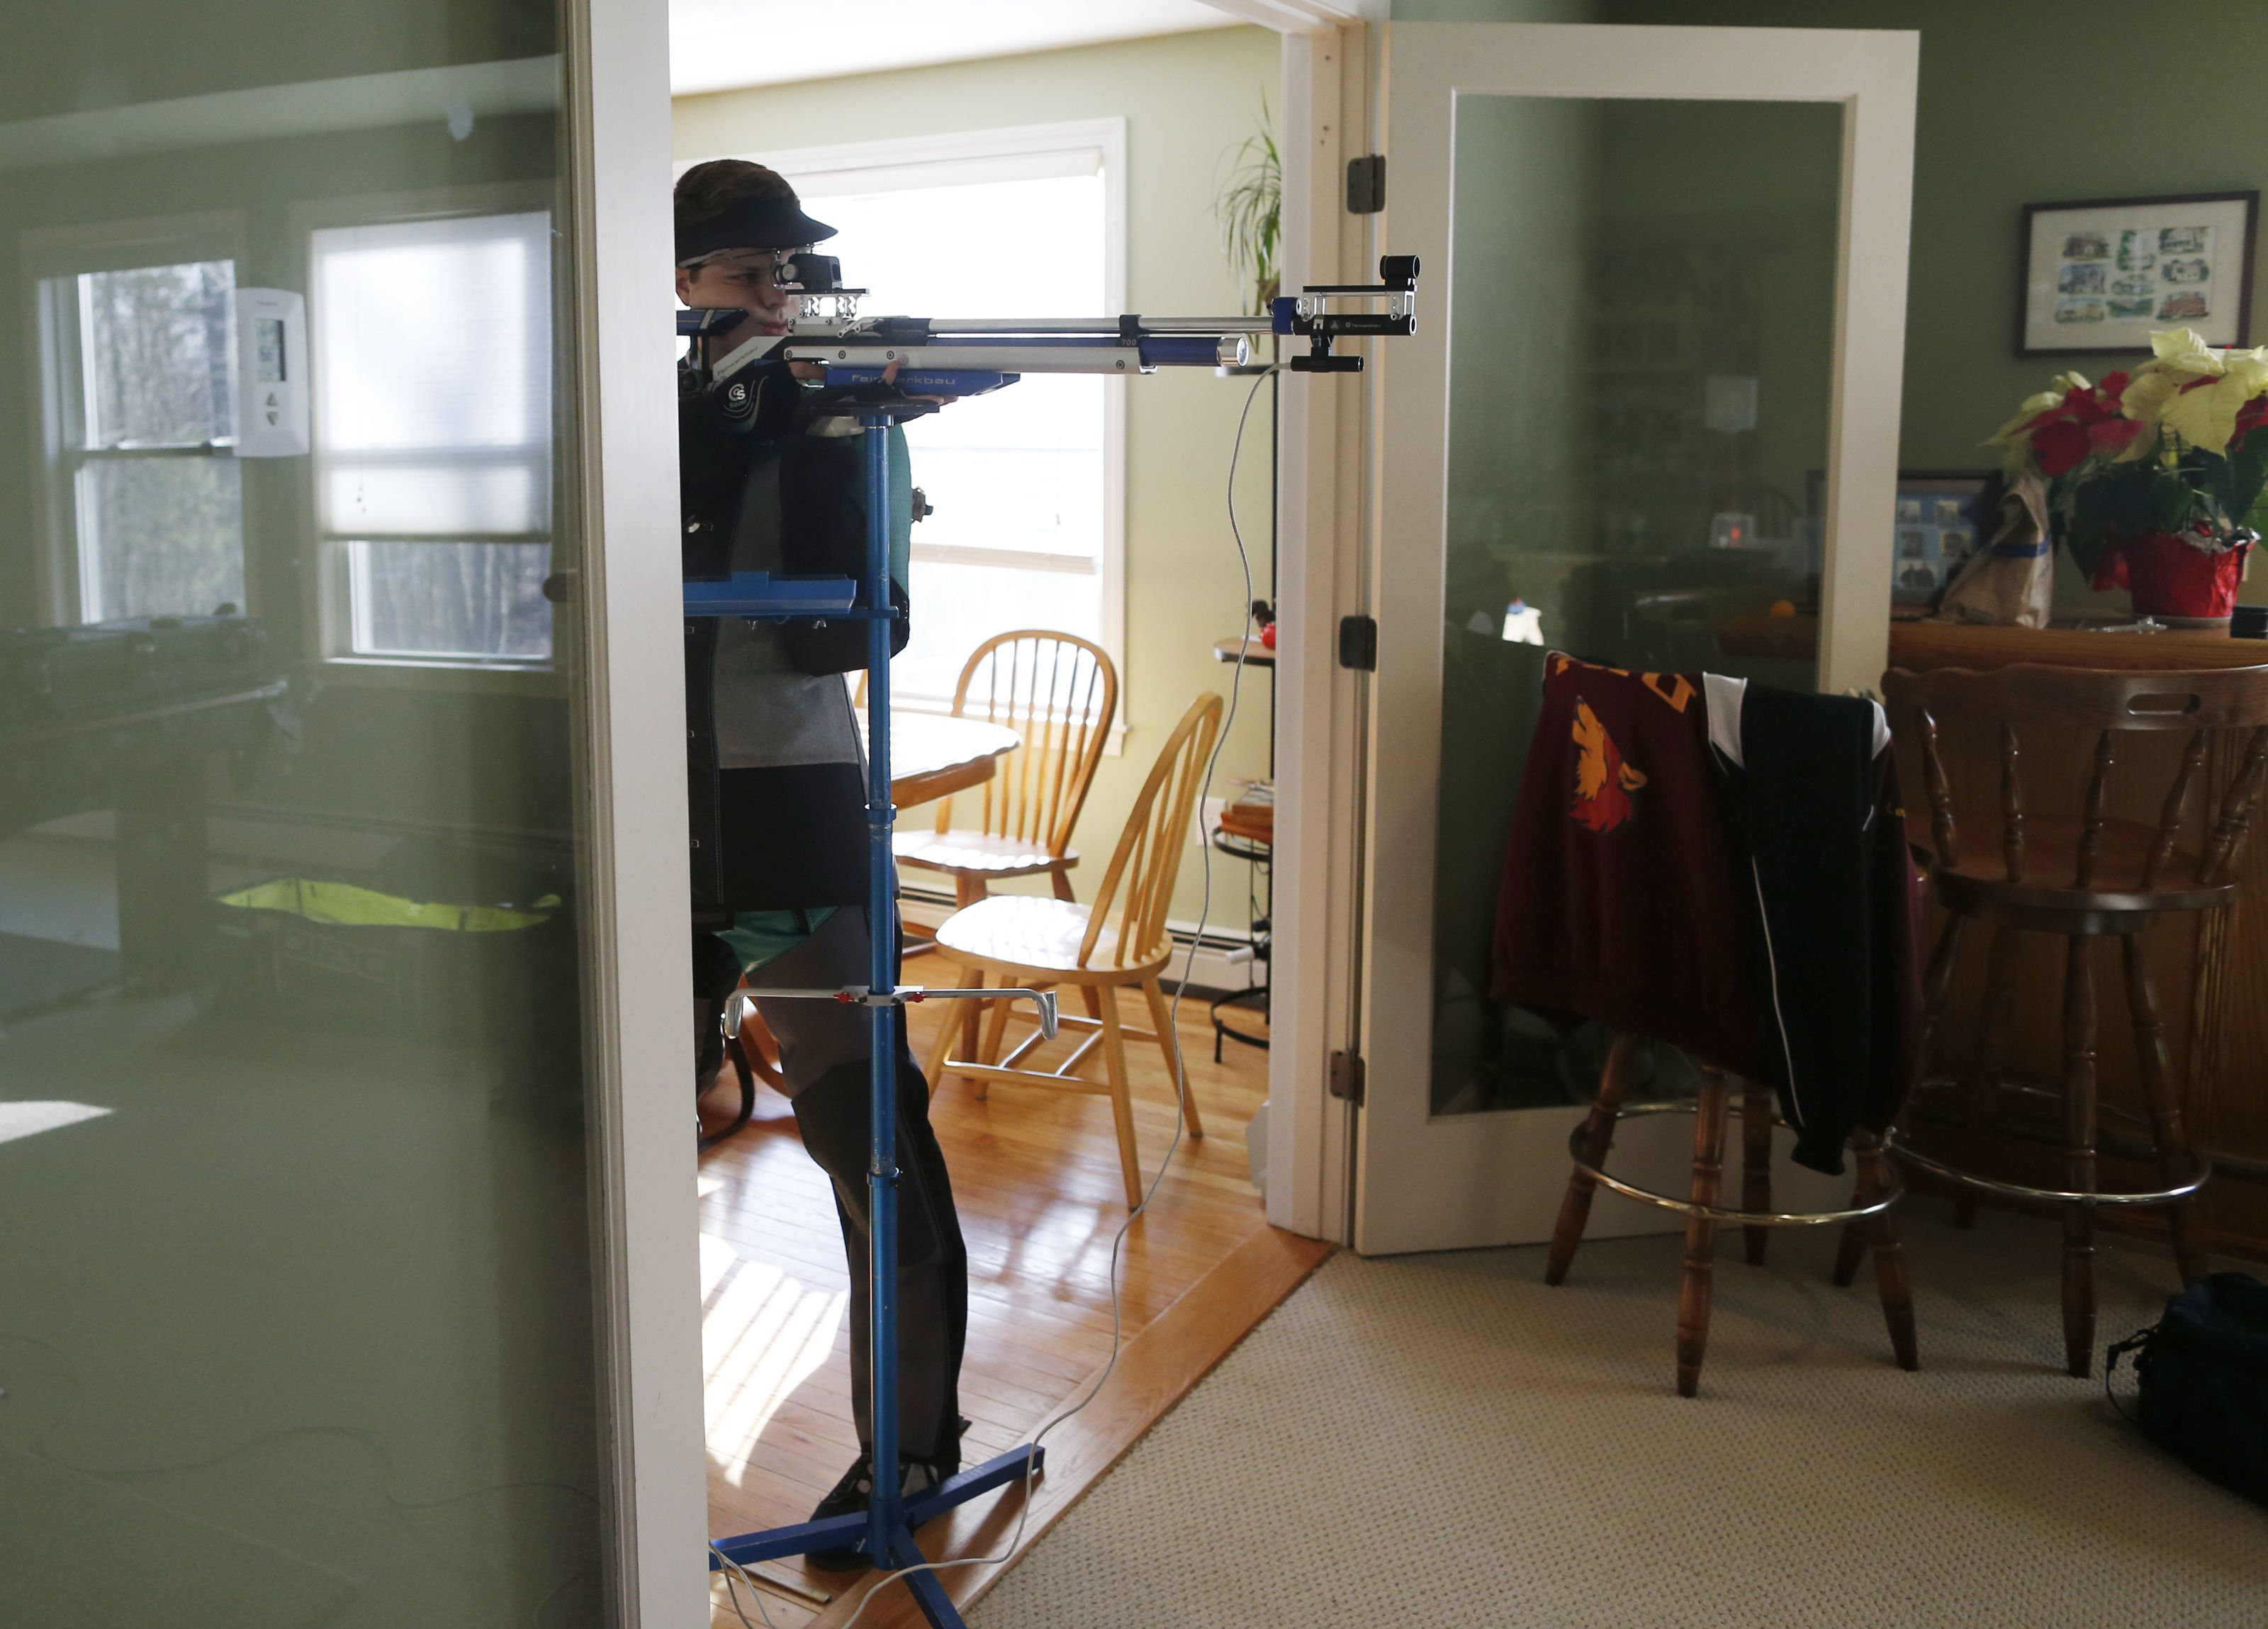 Gun controversy lost on new shooting stars - The Boston Globe